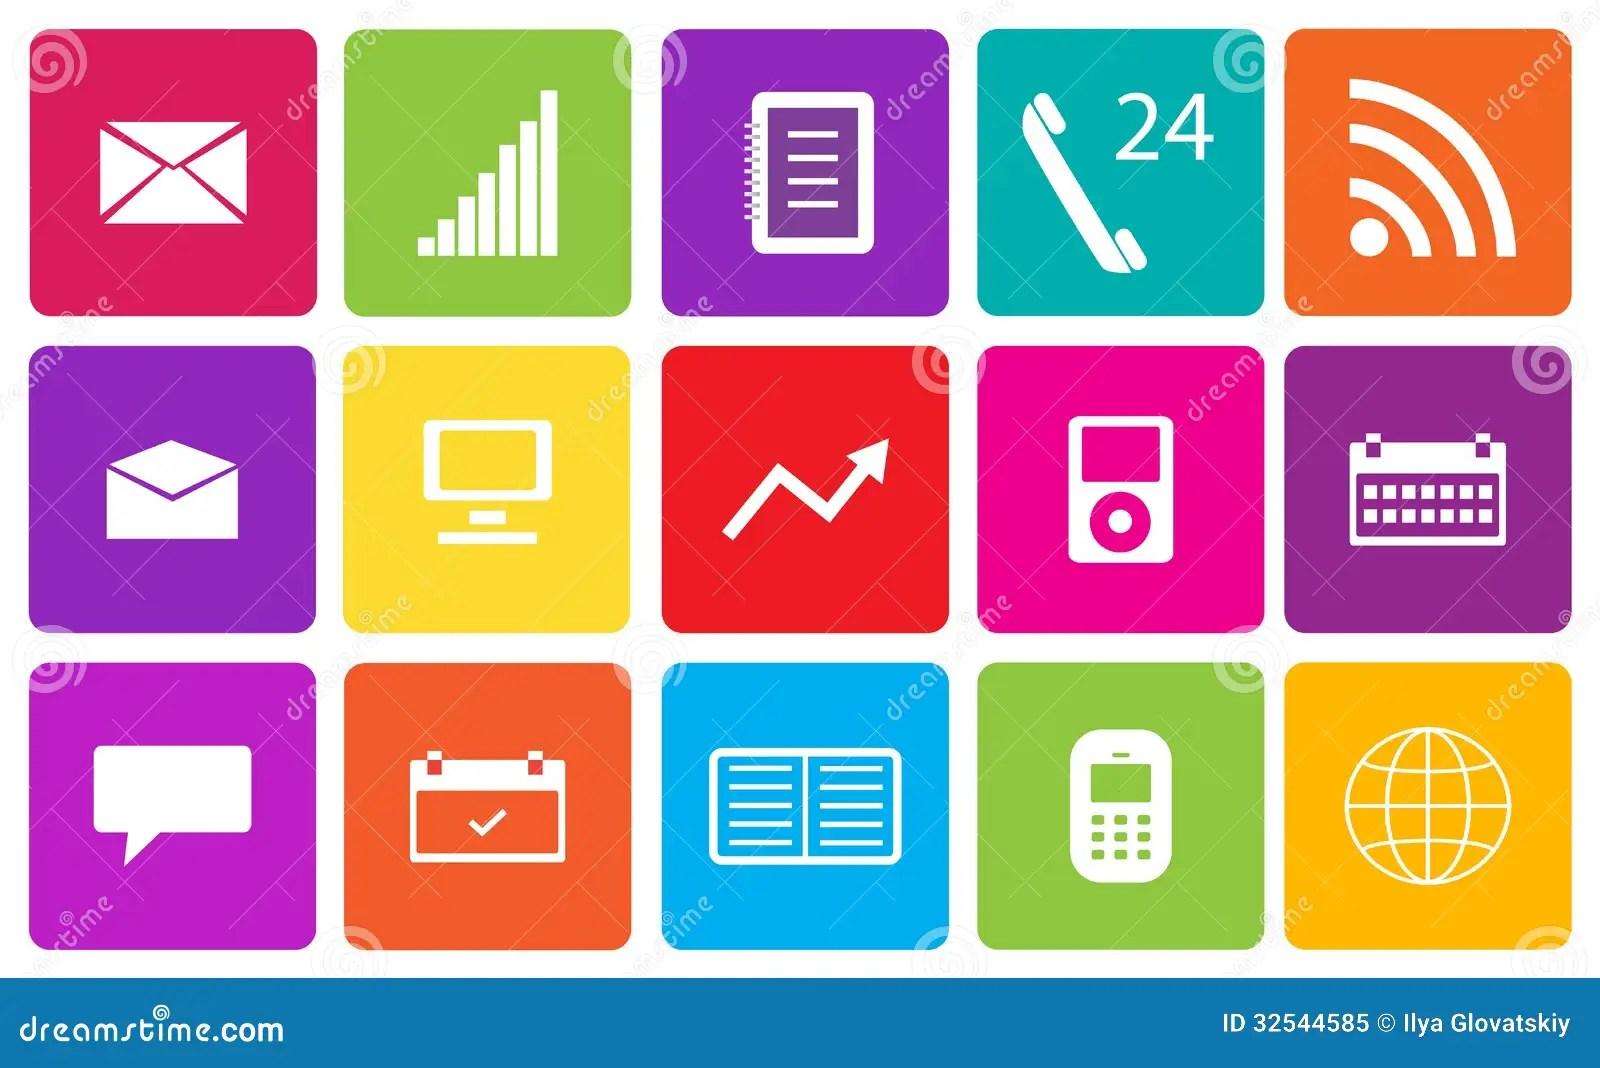 Set Of Communication And Media Icons Stock Illustration - Illustration of equipment. corporate: 32544585